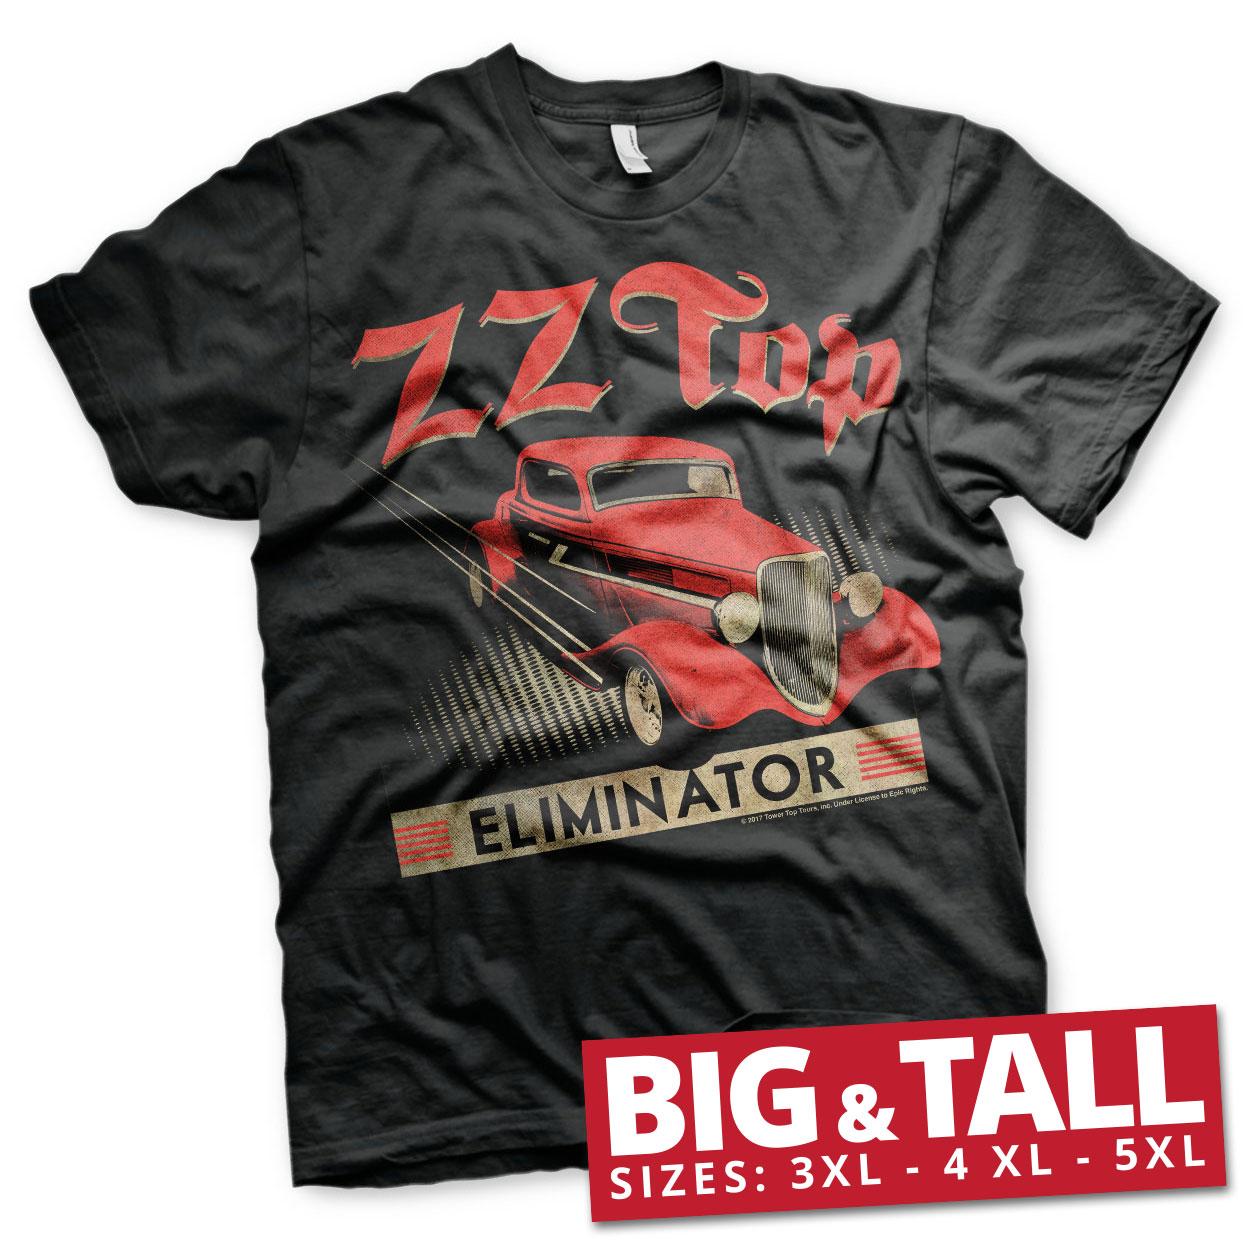 ZZ-Top Eliminator Big & Tall T-Shirt